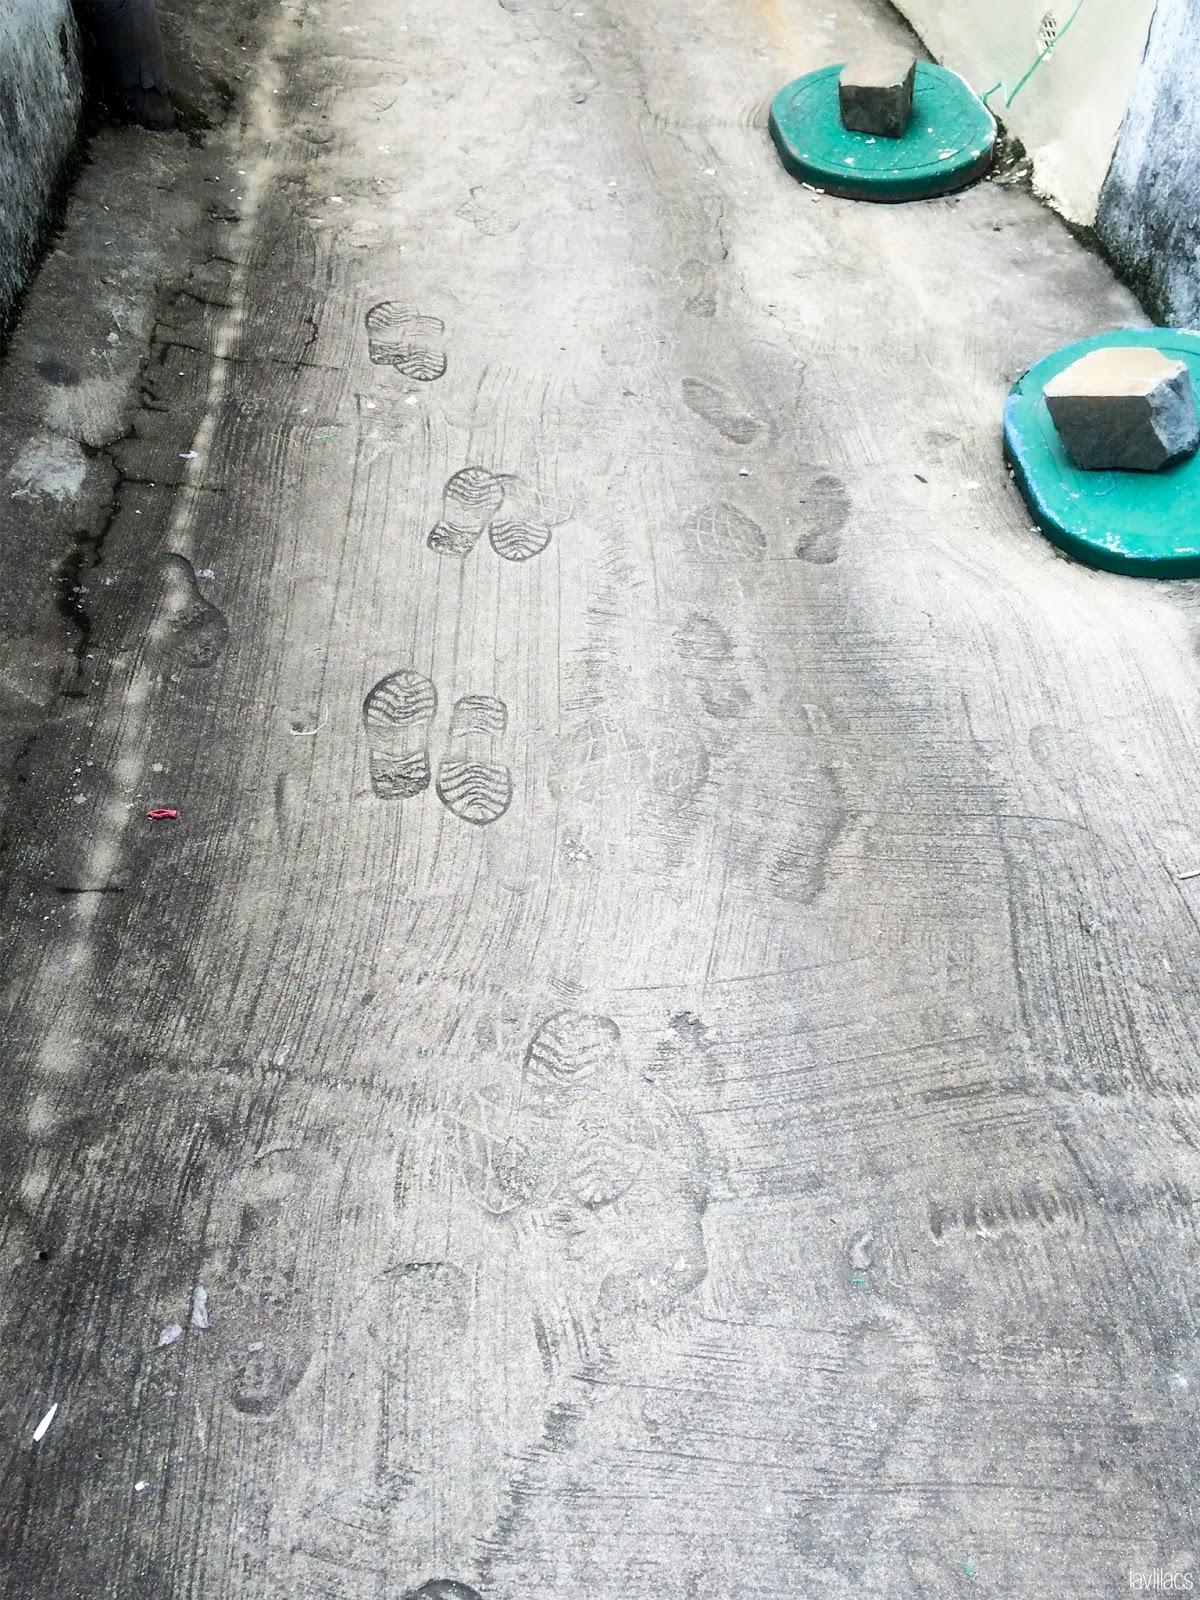 Seoul, Korea - Summer Study Abroad 2014 - Gamcheon Culture Village footprints